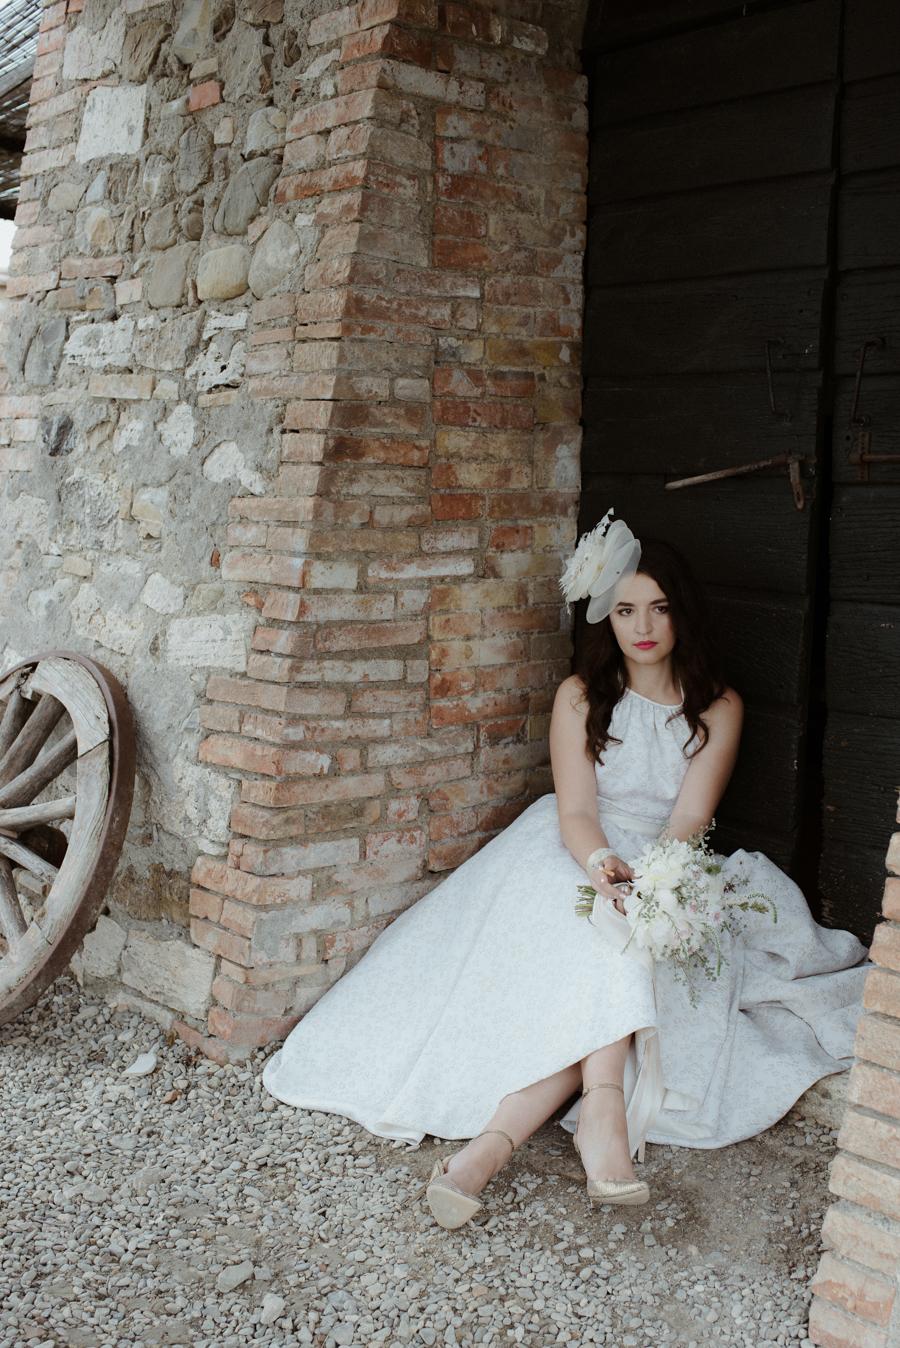 matrimonio-romantico-e-naturale-the-dolls-factory-bianco-photography-04